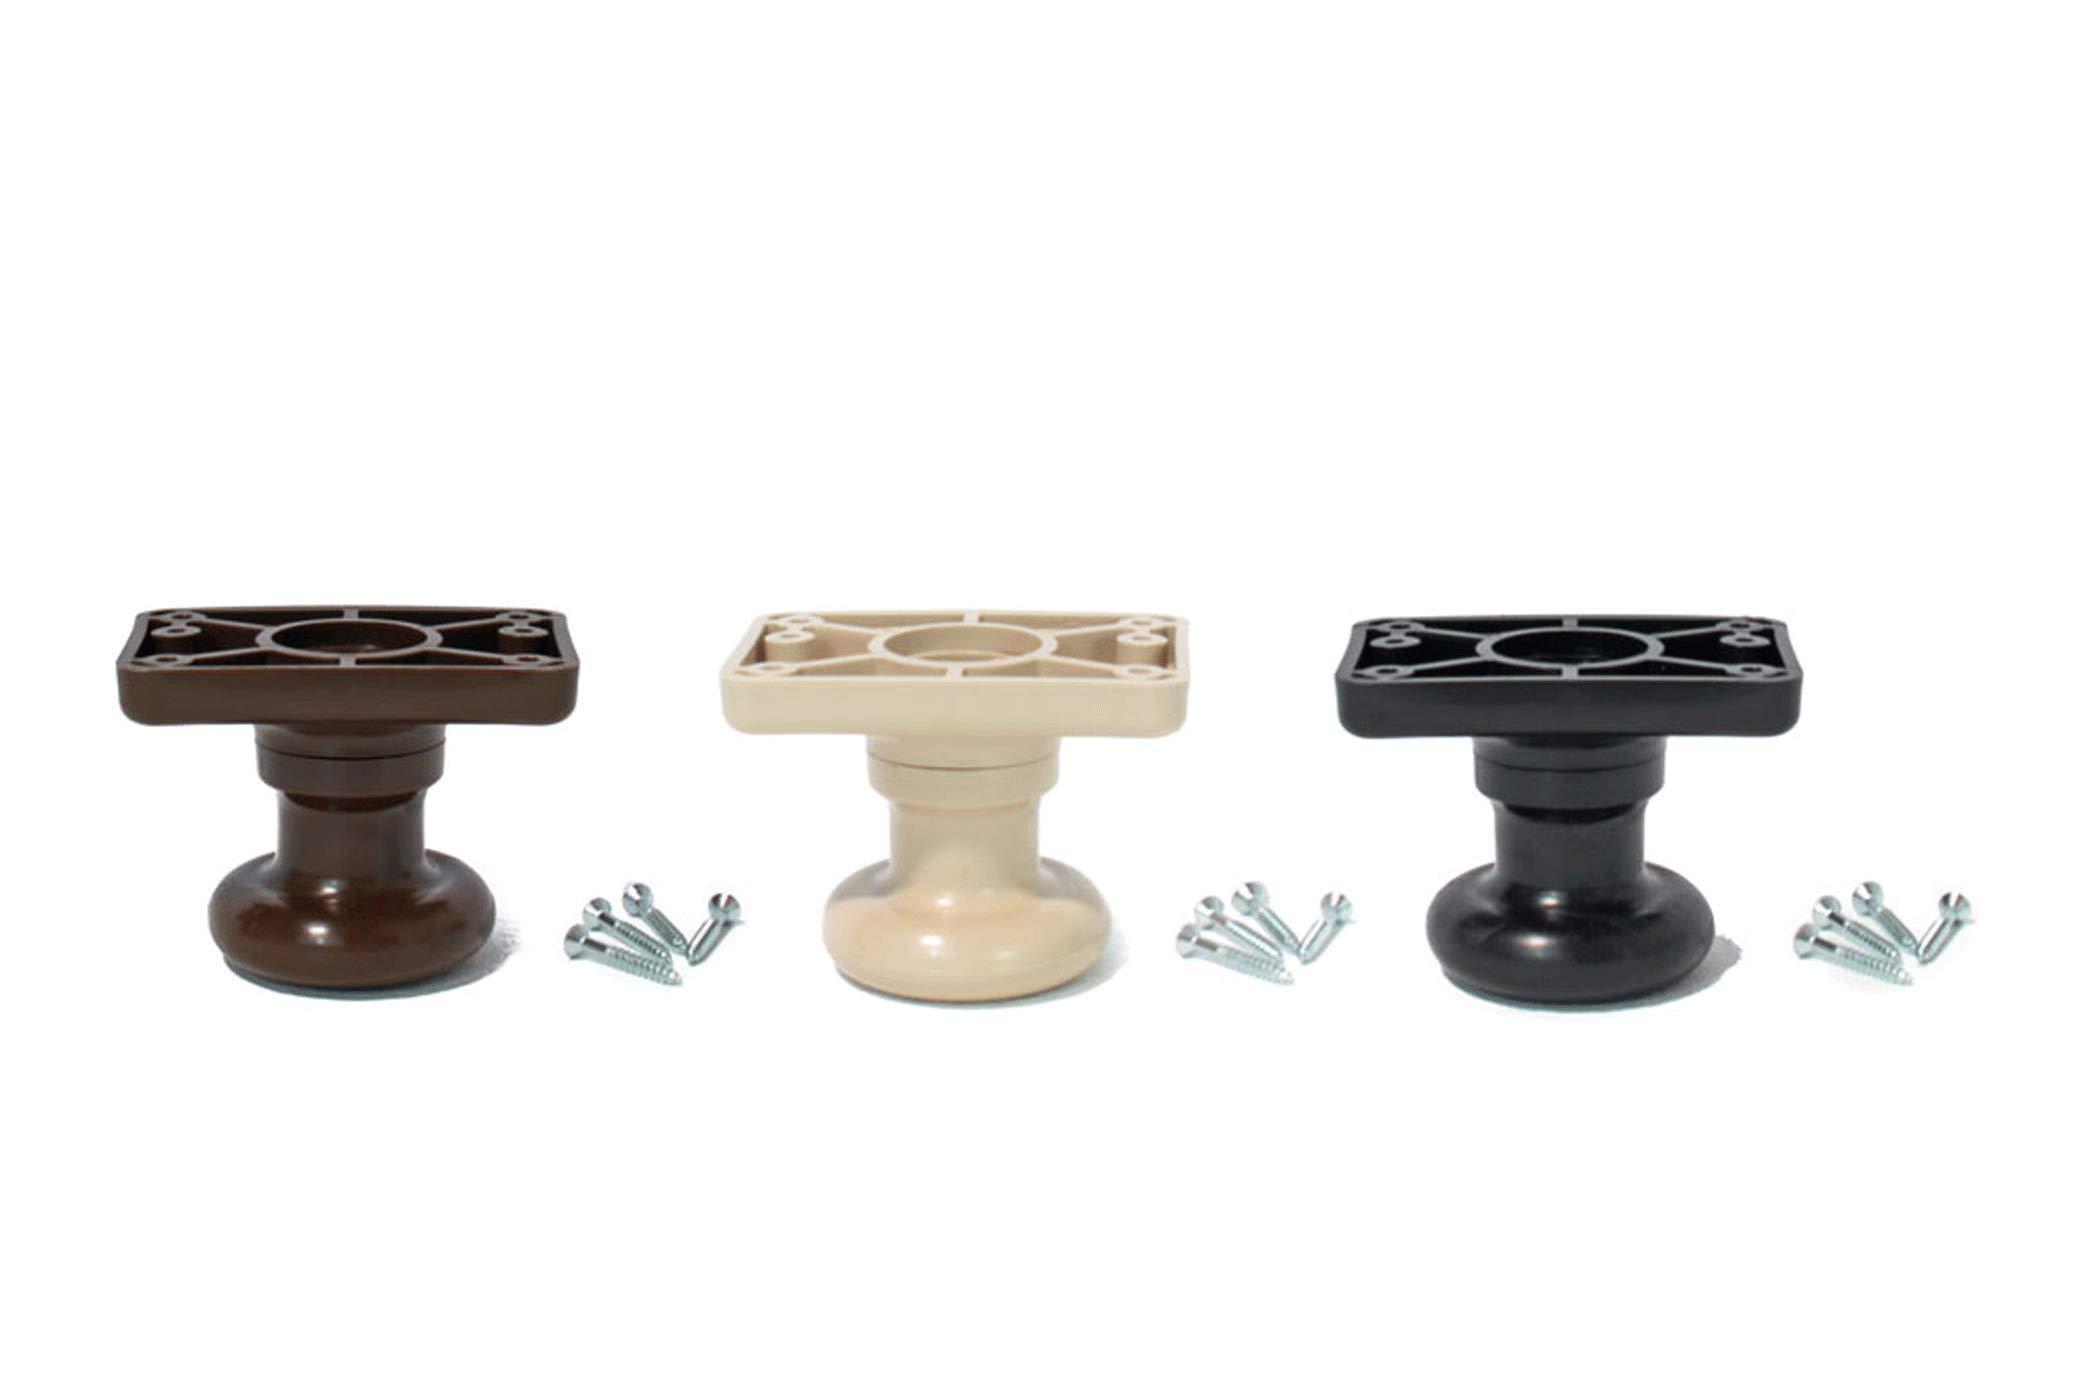 Universal Bedlegs 3'' 2Pc Plastic Screw-In Legs Set of 12, Sand